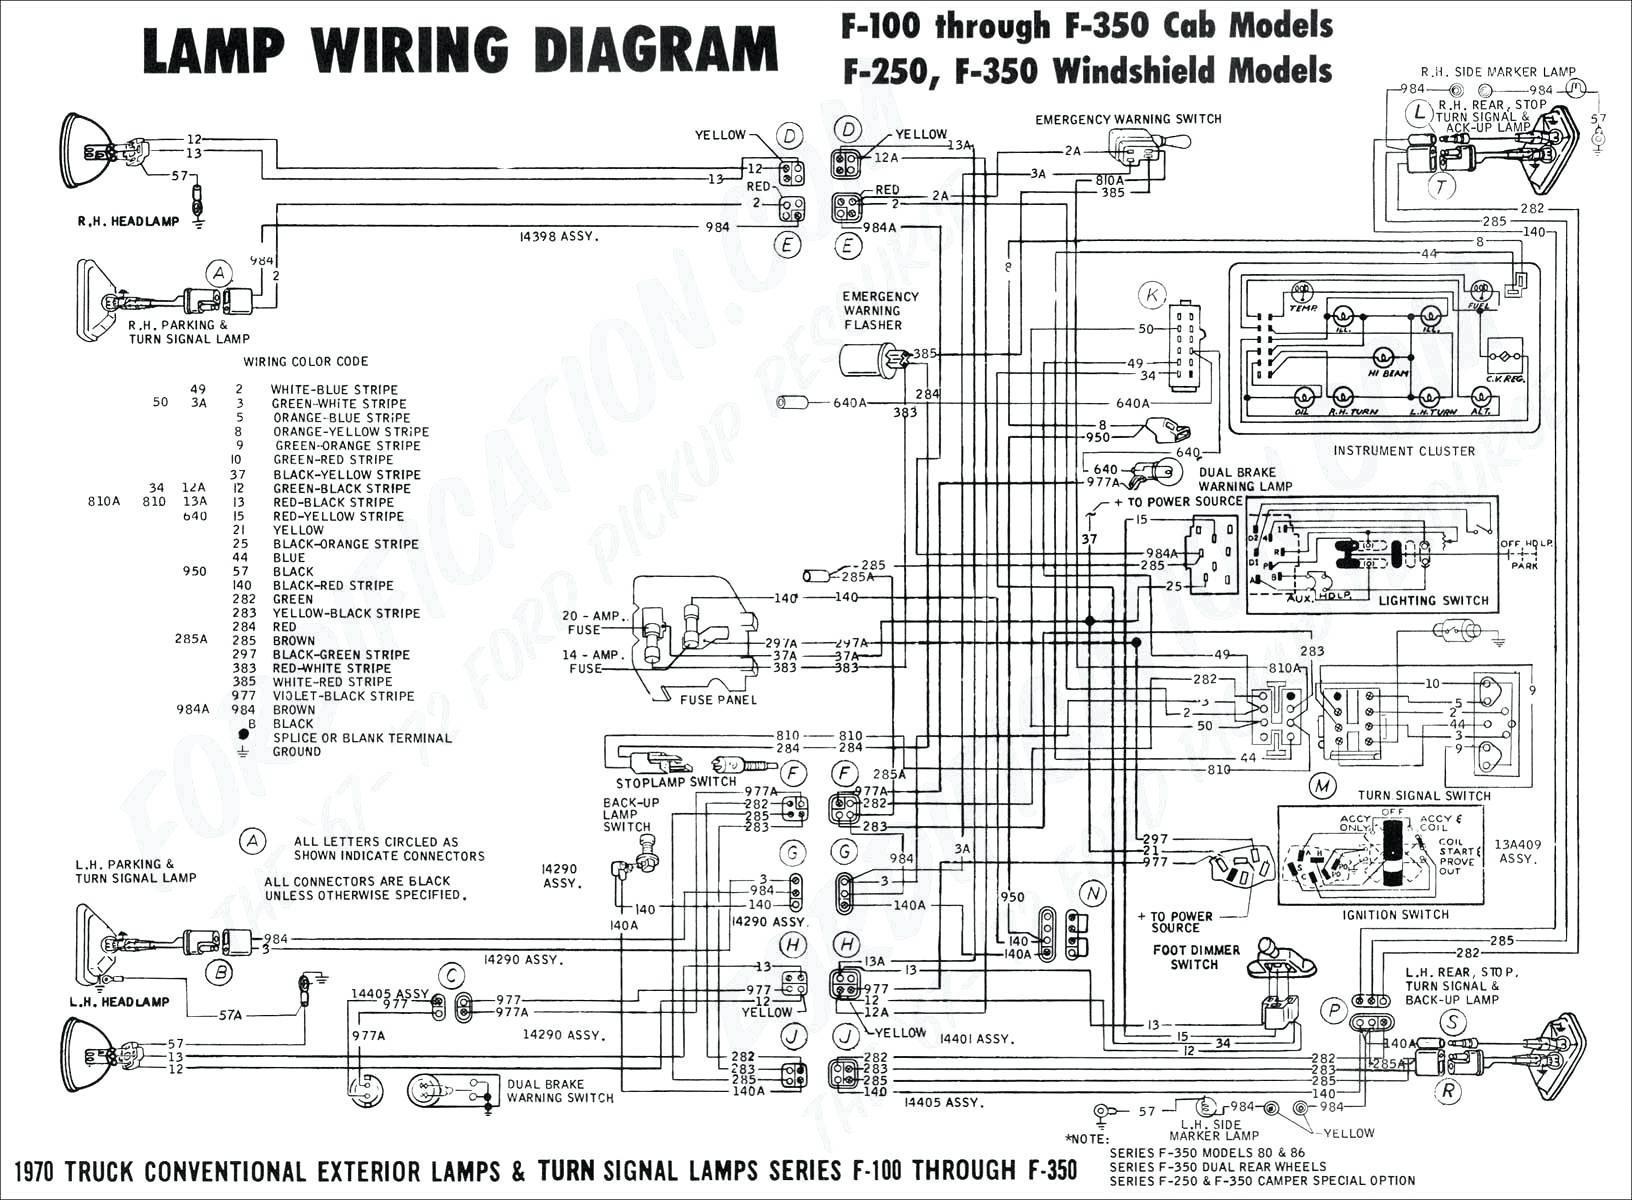 Gas Furnace Parts Diagram Circuit Diagram Ponents Of Gas Furnace Parts Diagram